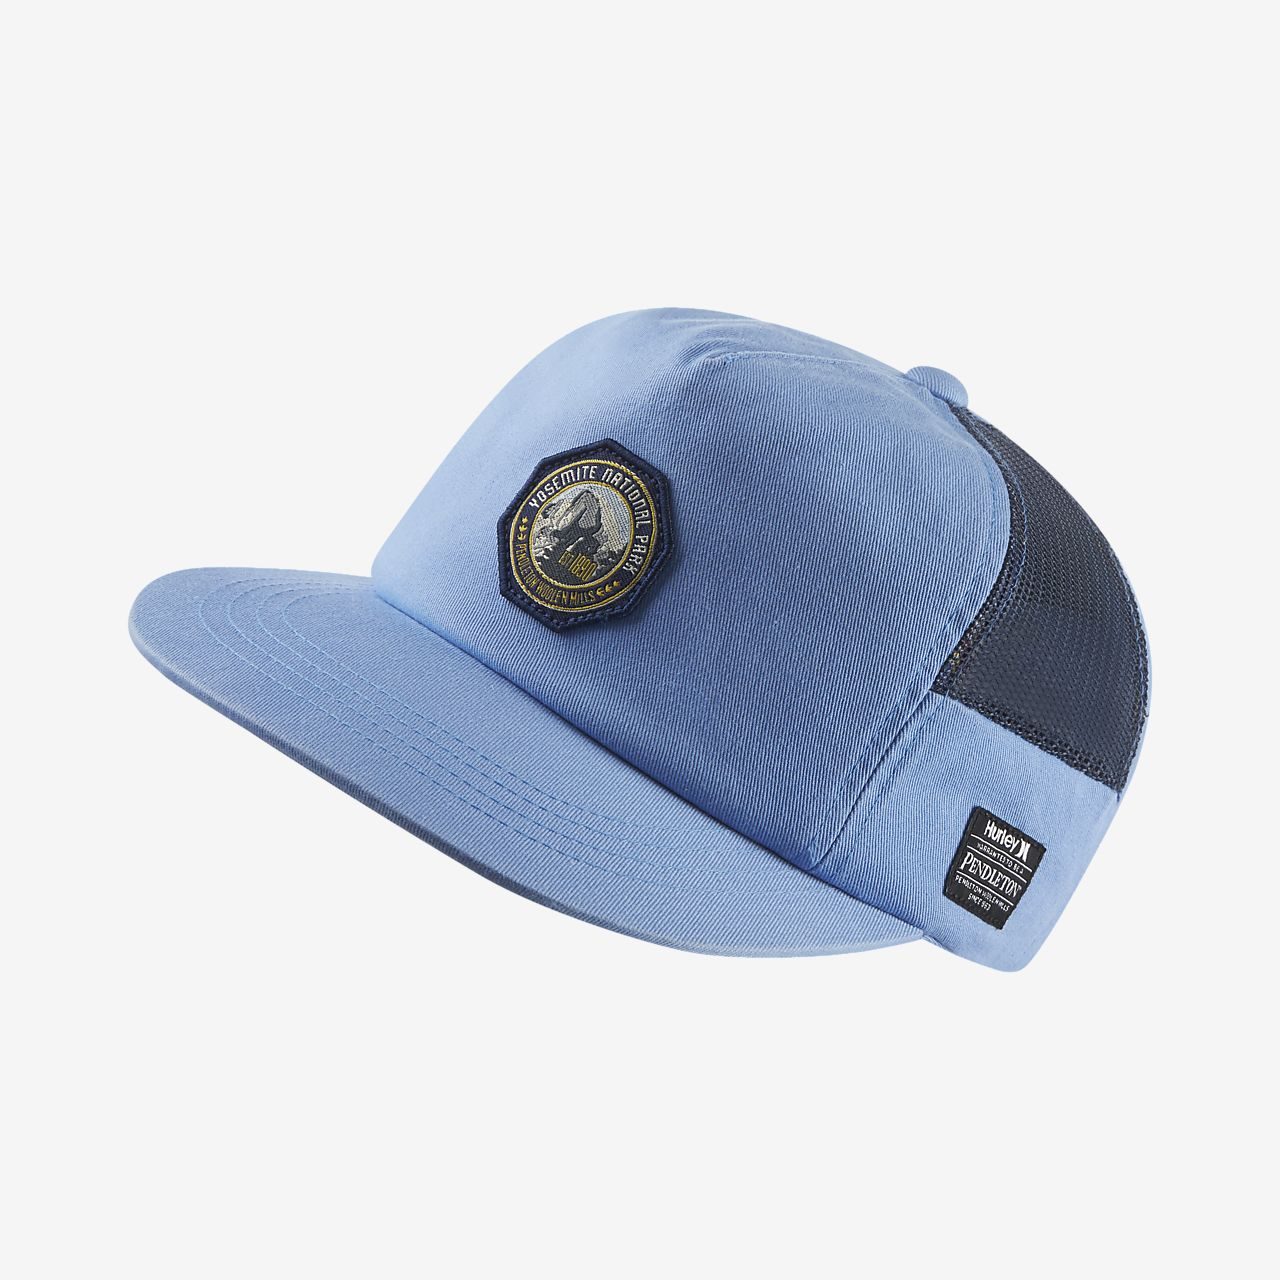 Hurley Pendleton Yosemite Men s Adjustable Hat. Nike.com 2c3d17da88d1